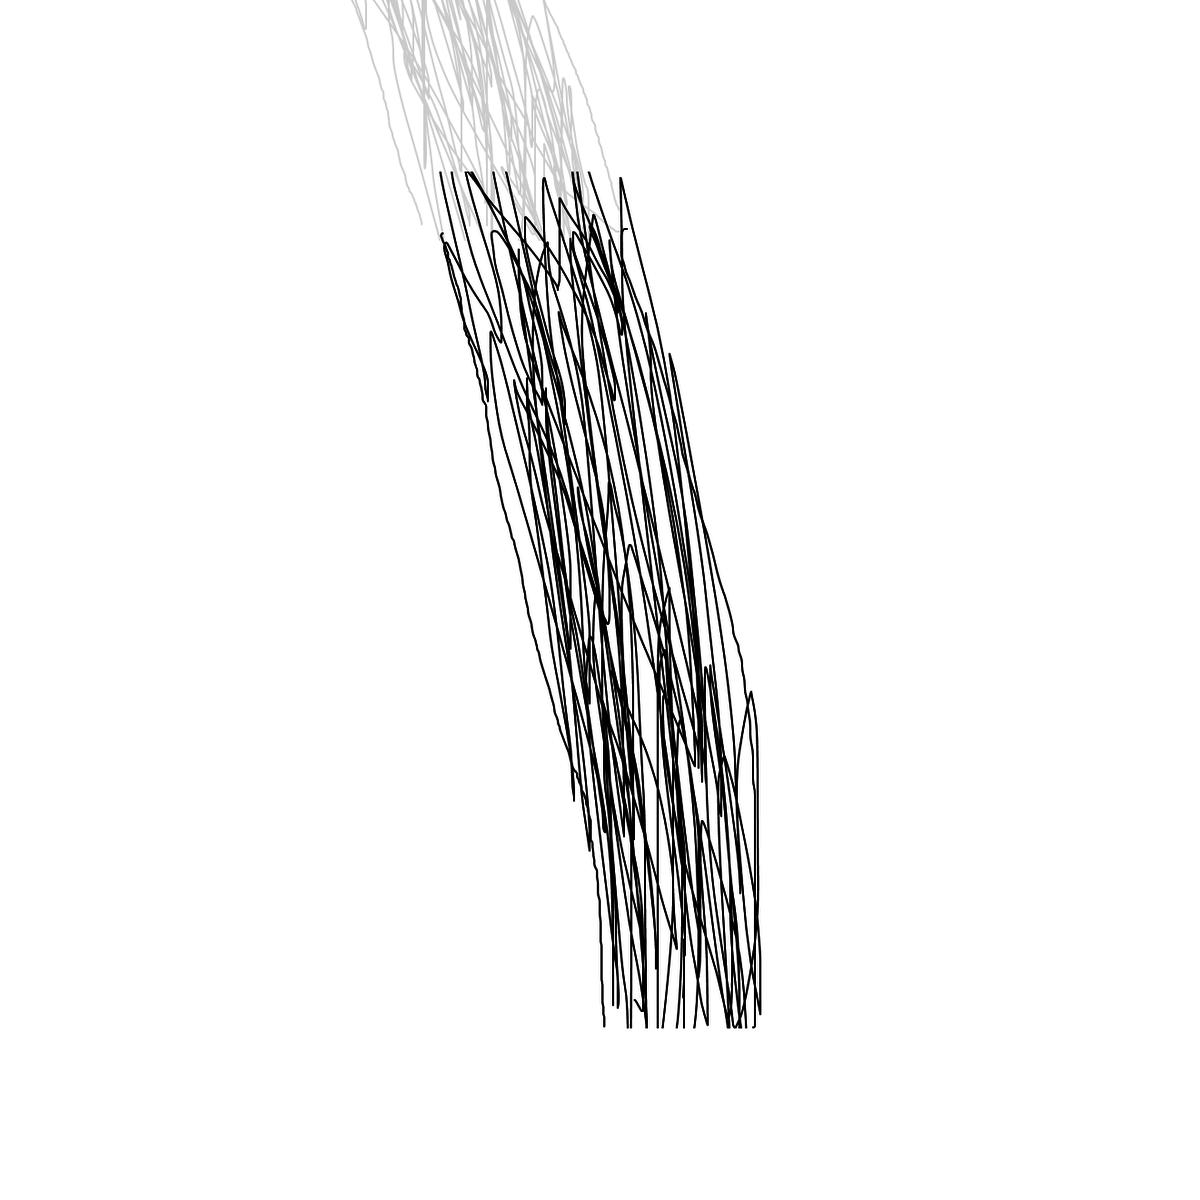 BAAAM drawing#11404 lat:52.4759407043457000lng: 13.4058027267456050